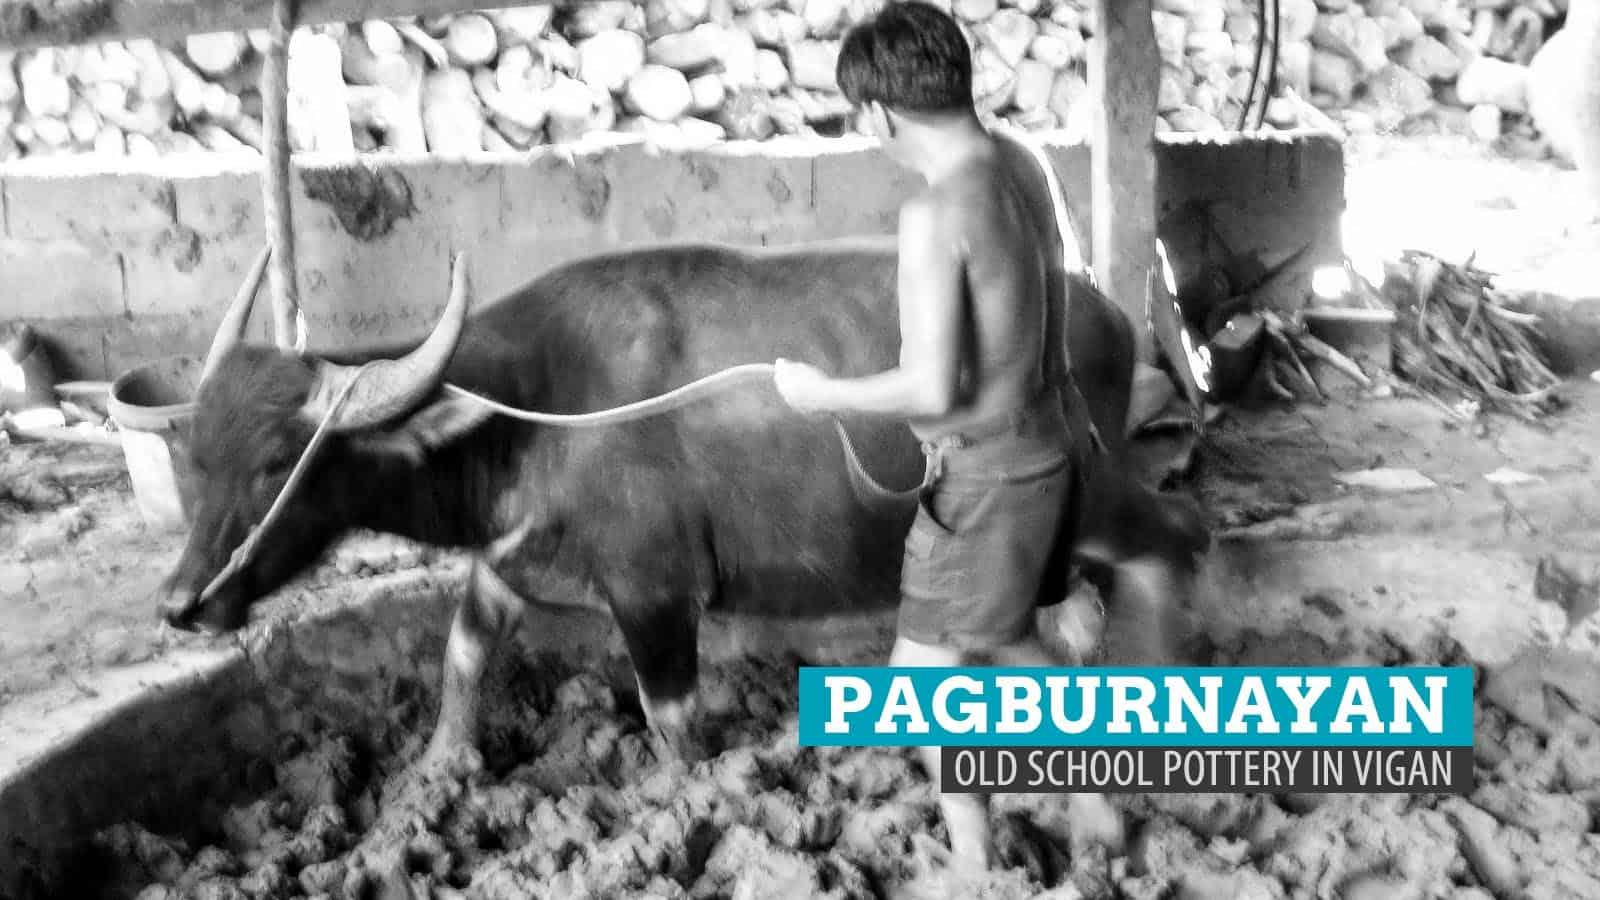 Pagburnayan:菲律宾南伊罗戈斯省维甘市的老式陶器   穷游者的行程博客